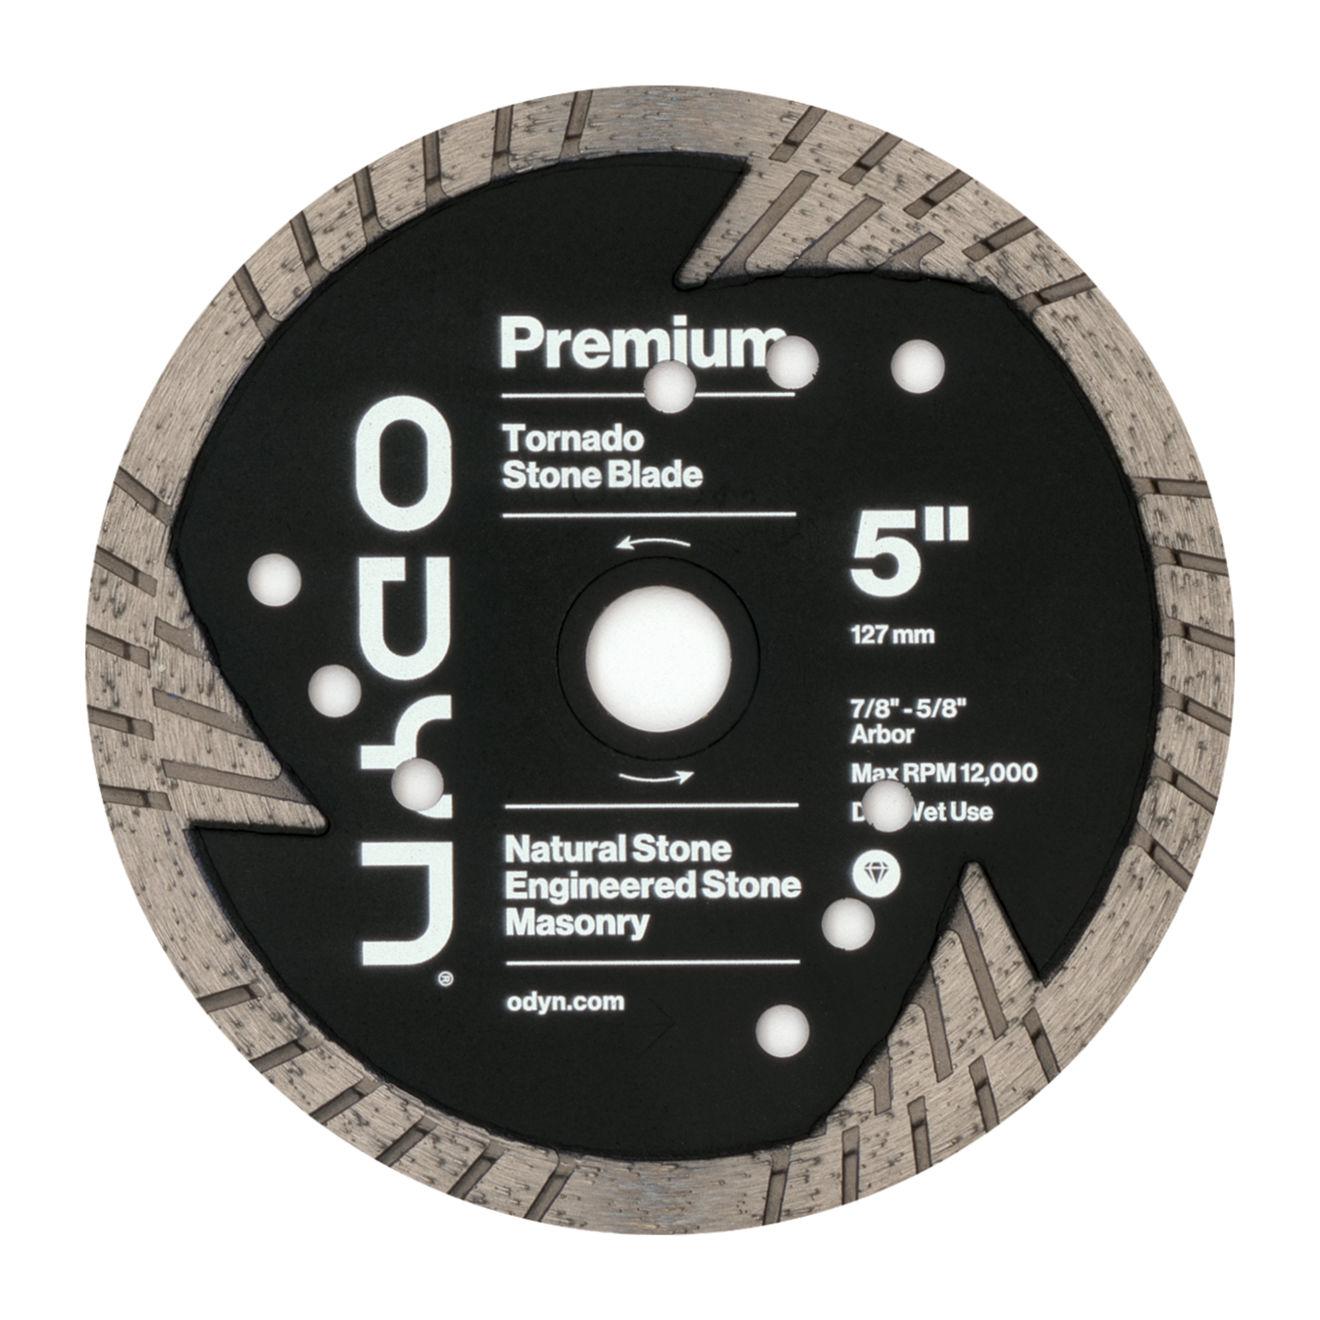 Odyn 5 in. Premium Tornado Stone Blade